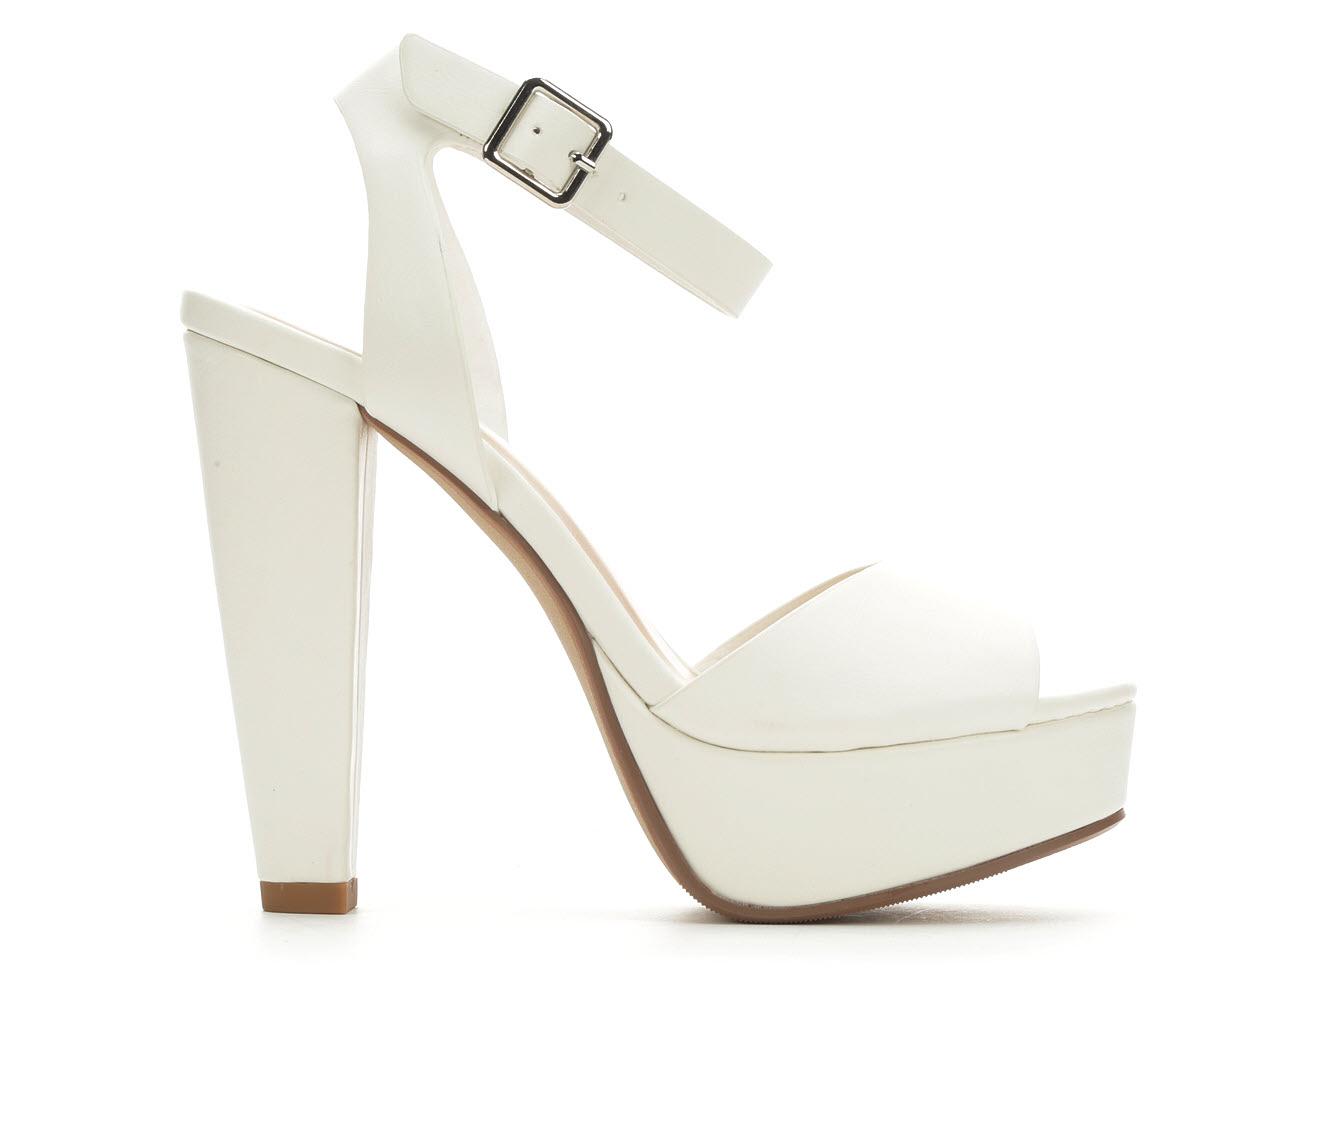 Delicious Purify Women's Dress Shoe (White Faux Leather)